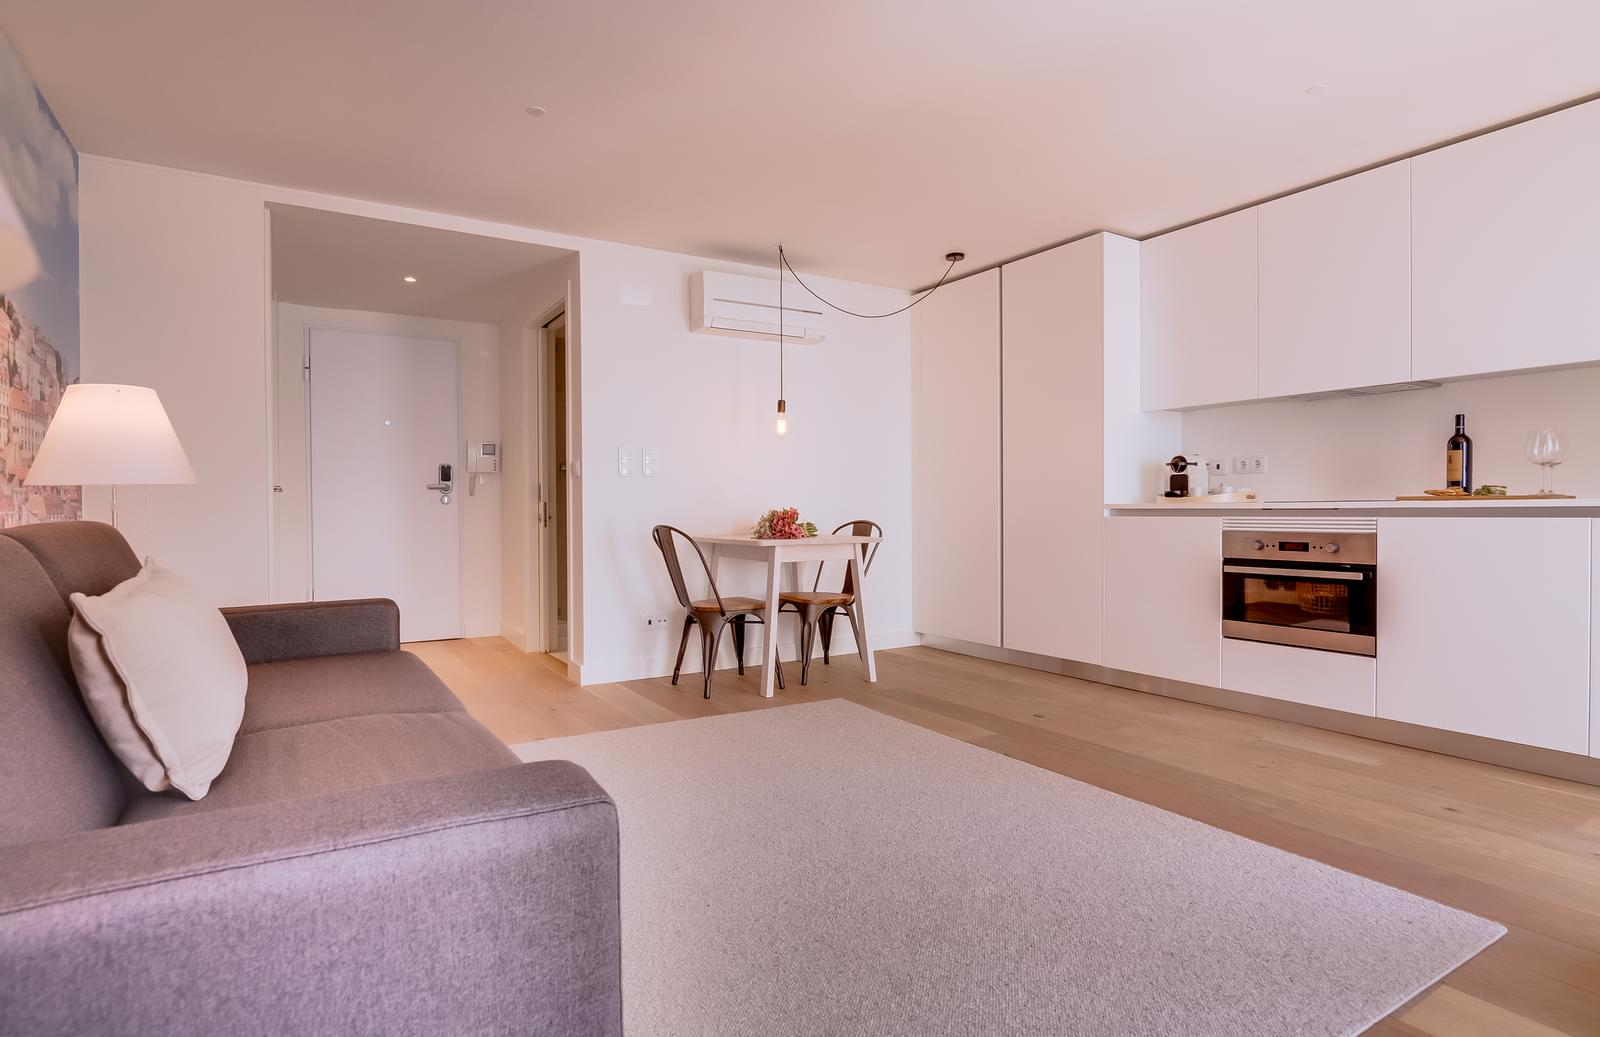 pf16967-apartamento-t0-lisboa-51e1bc62-06c8-457c-aa54-0299cc9b9513